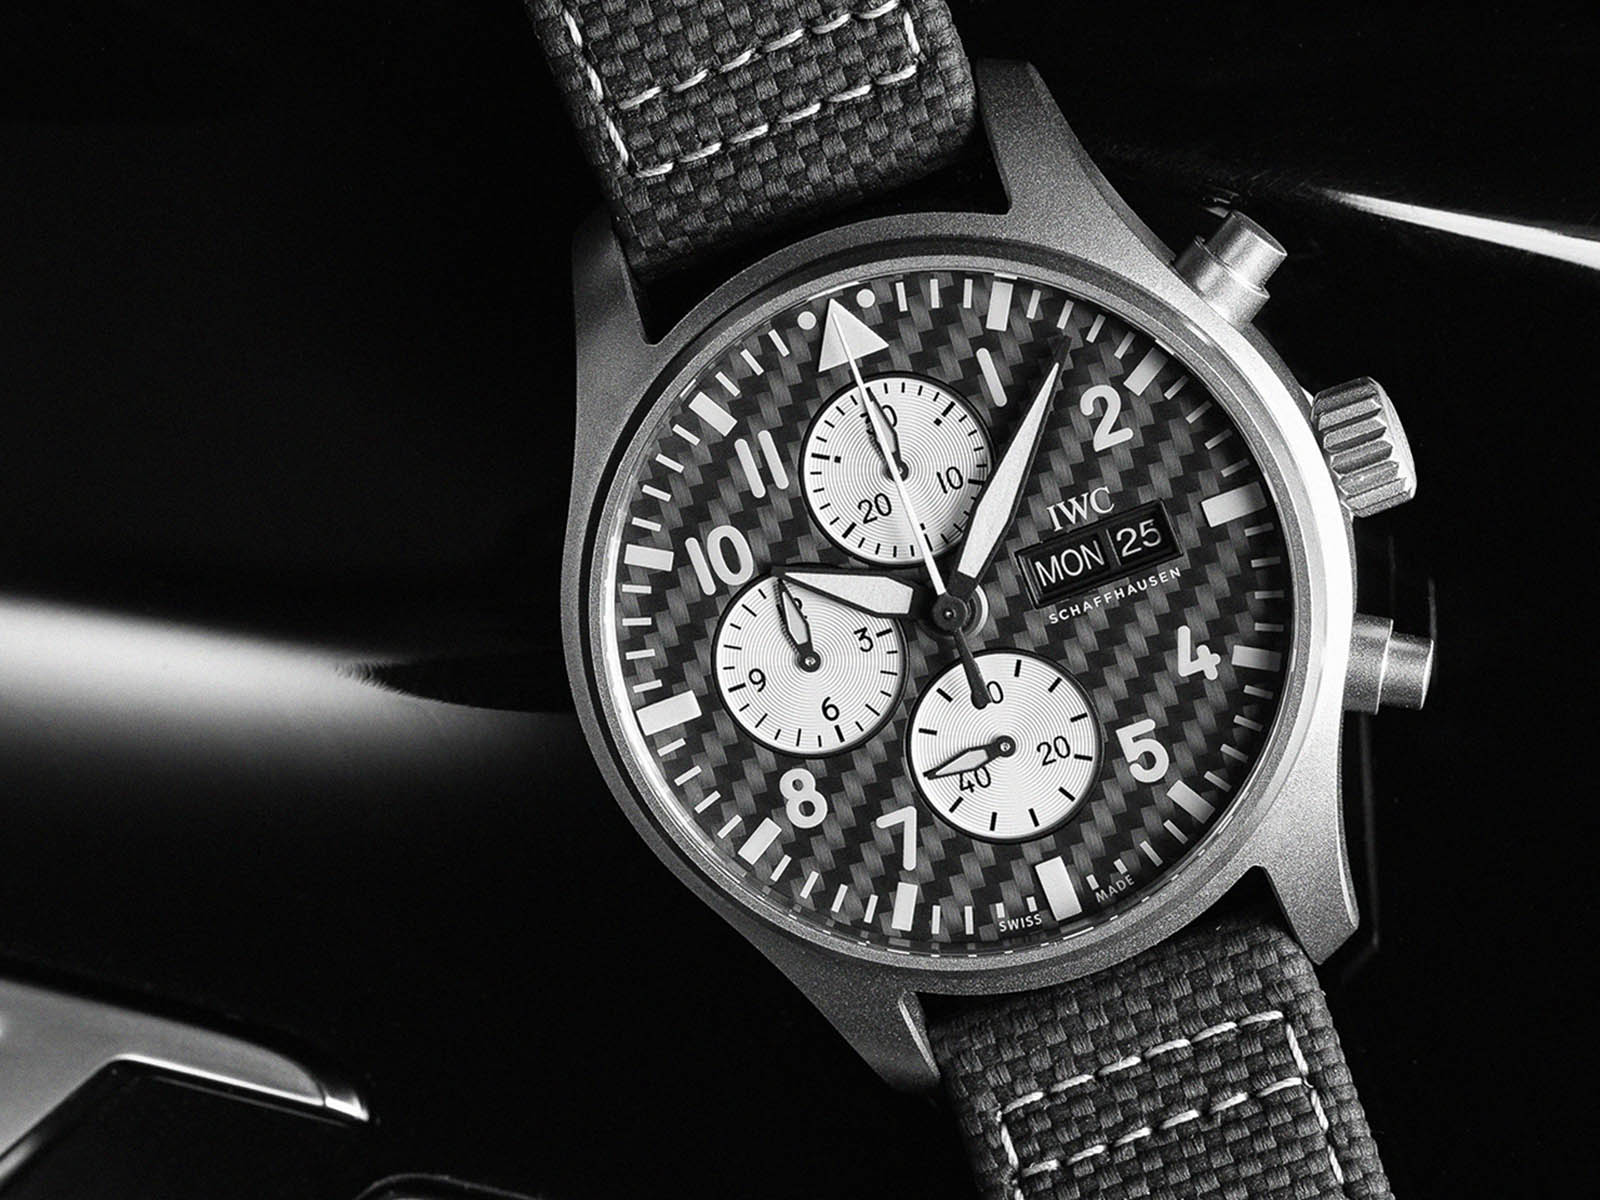 iw377903-iwc-pilot-s-watch-chronograph-edition-amg-4.jpg